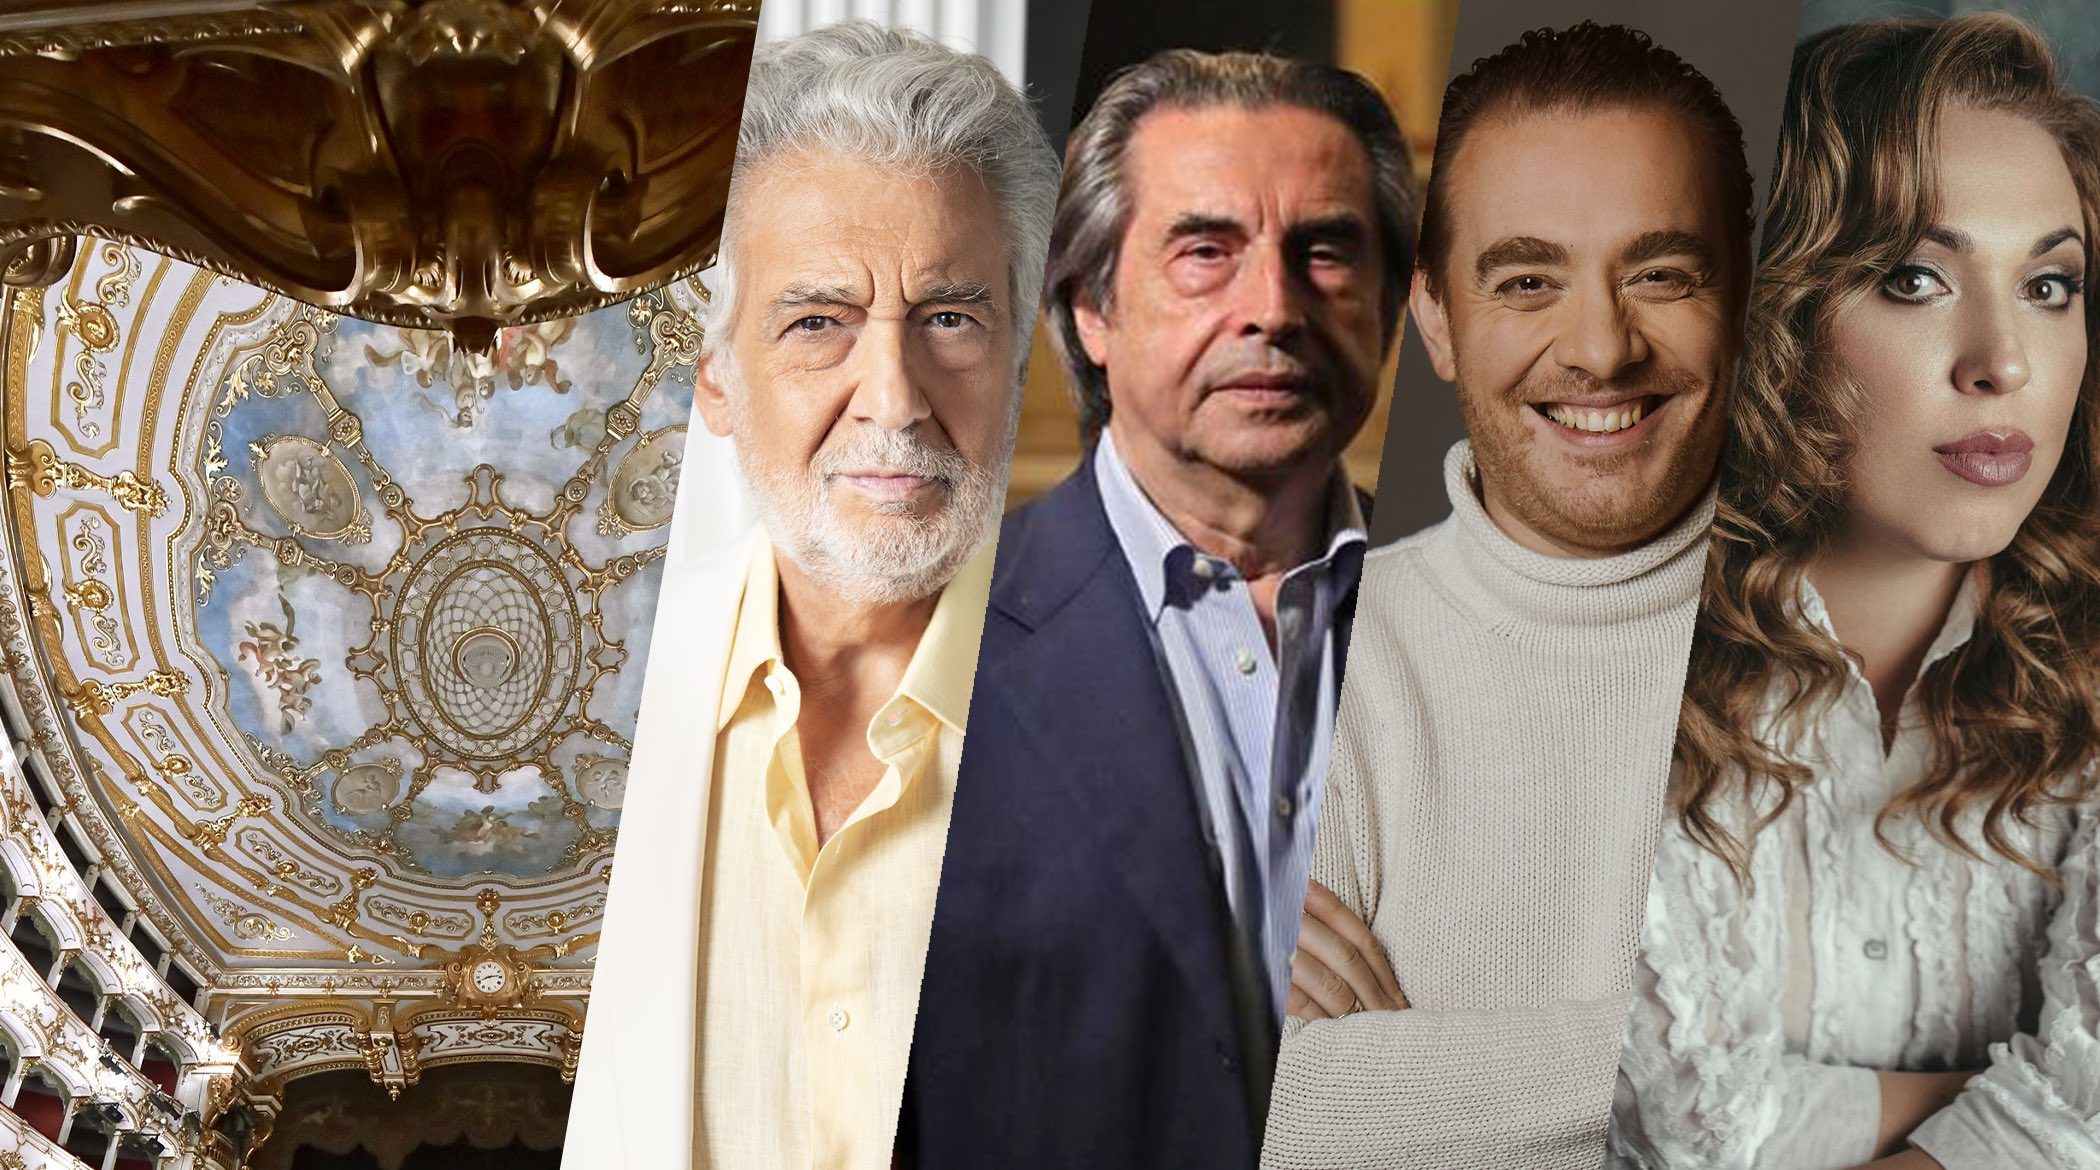 Piacenza 2021; Teatro Municipale Piacenza; Placido Domingo; Francesco Meli, Riccardo Muti; Luca Salsi; Maria José Siri